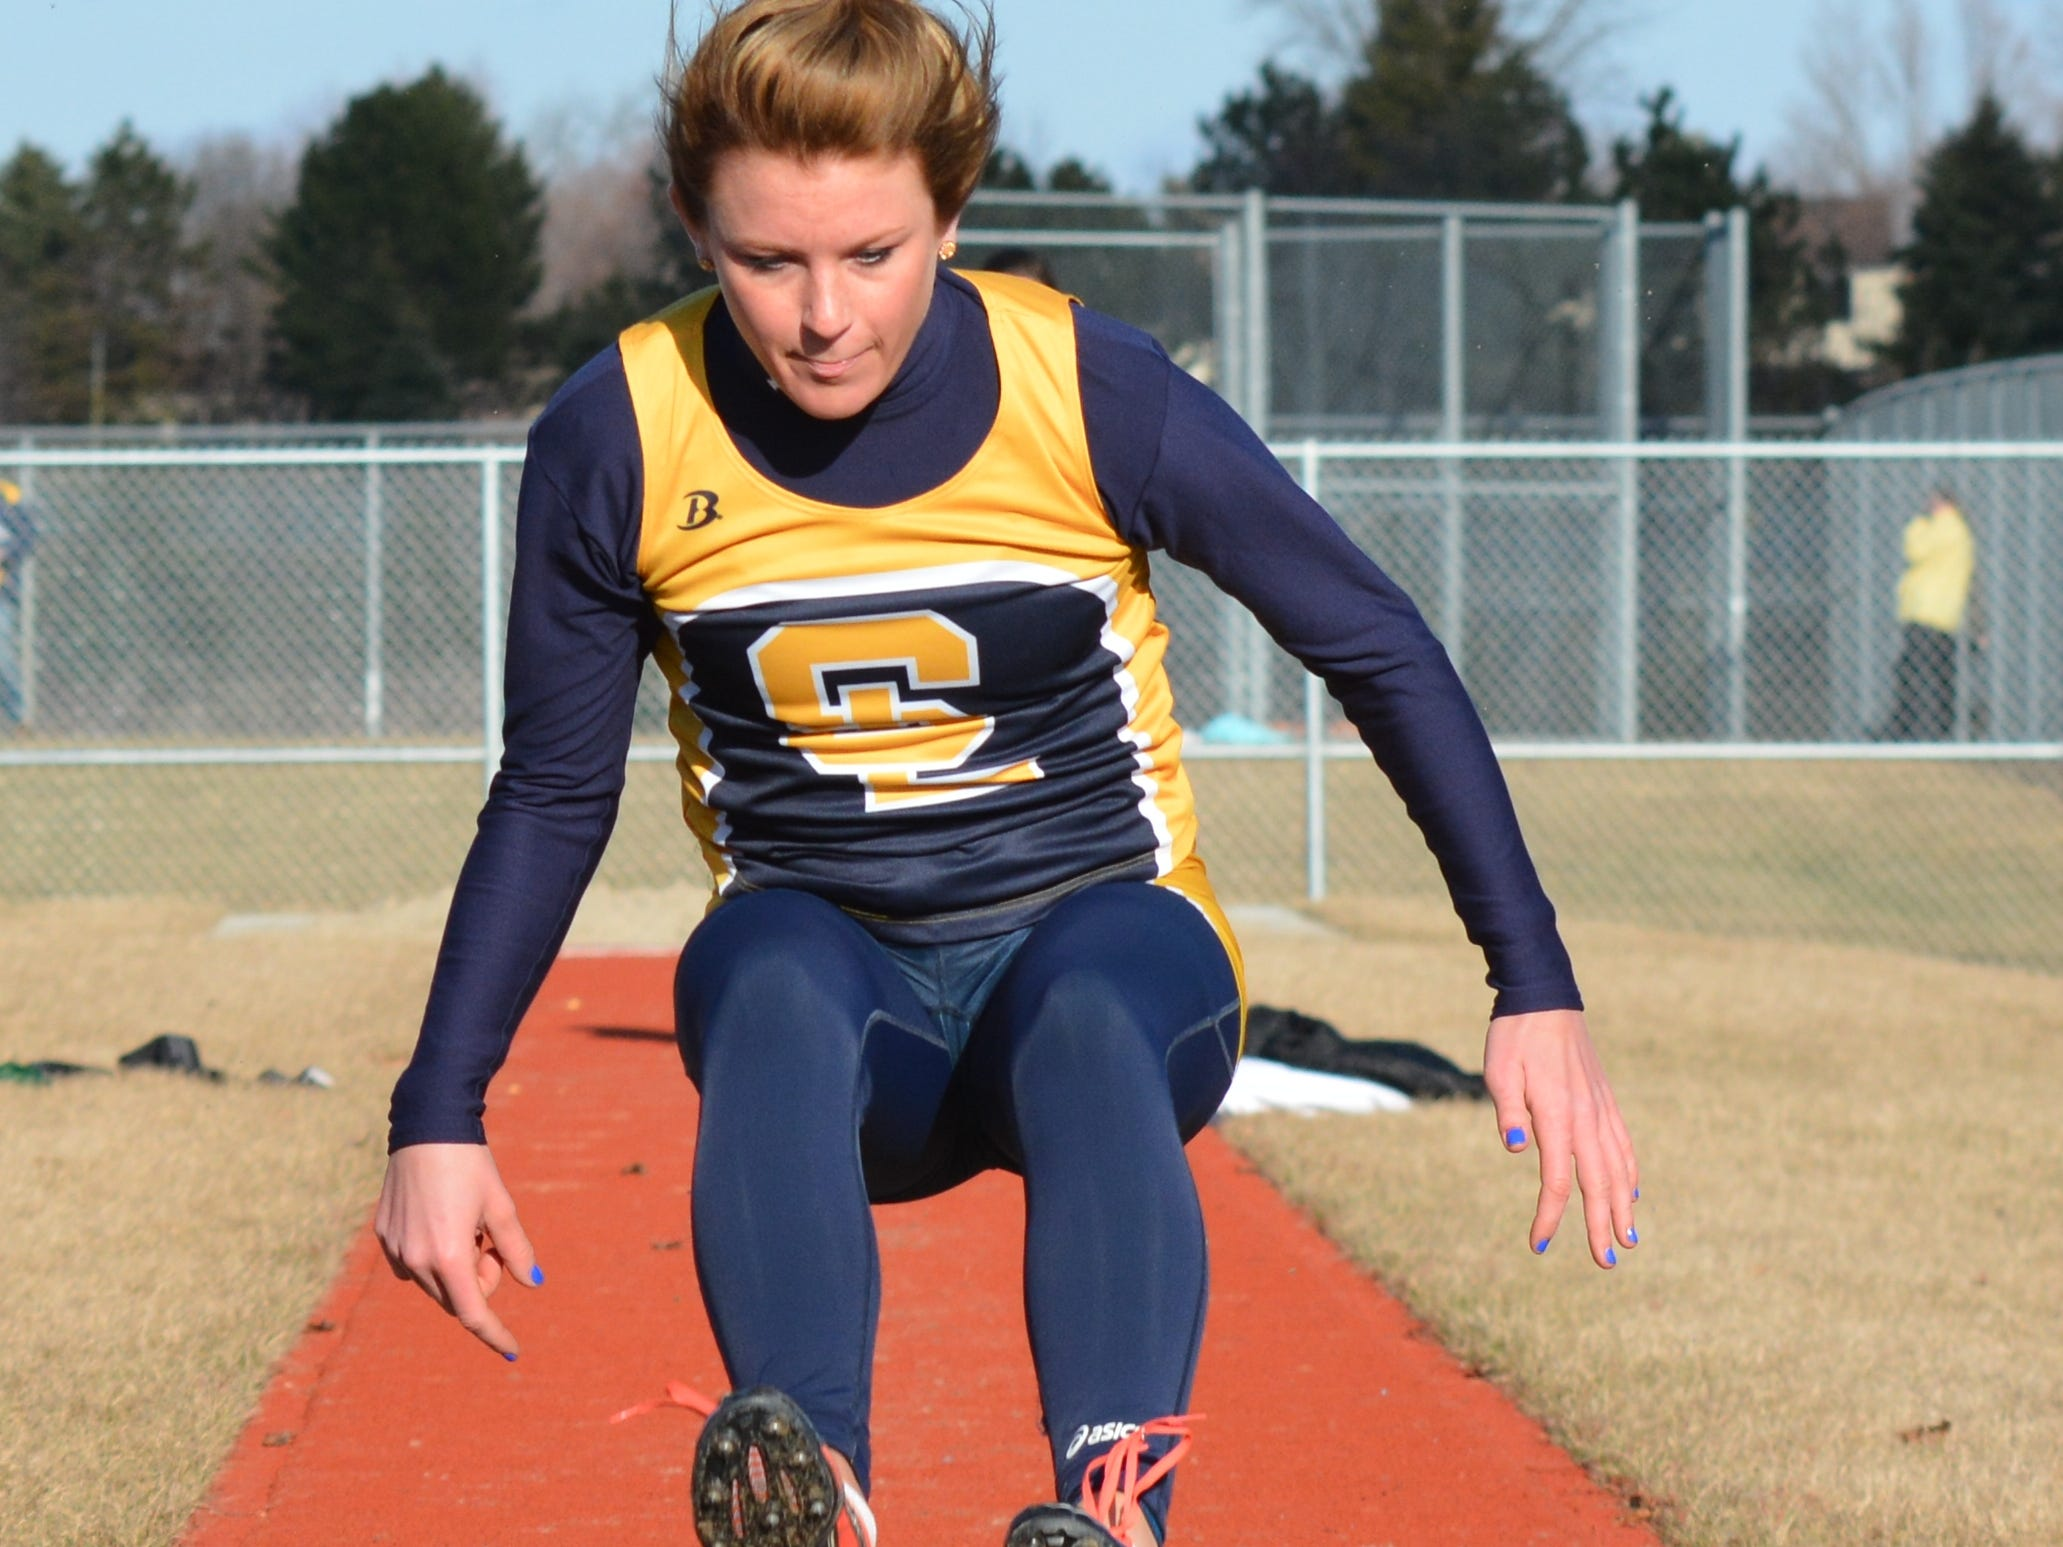 South Lyon's Carlie Fernandez lands her high jump attempt in the opening meet against Novi.